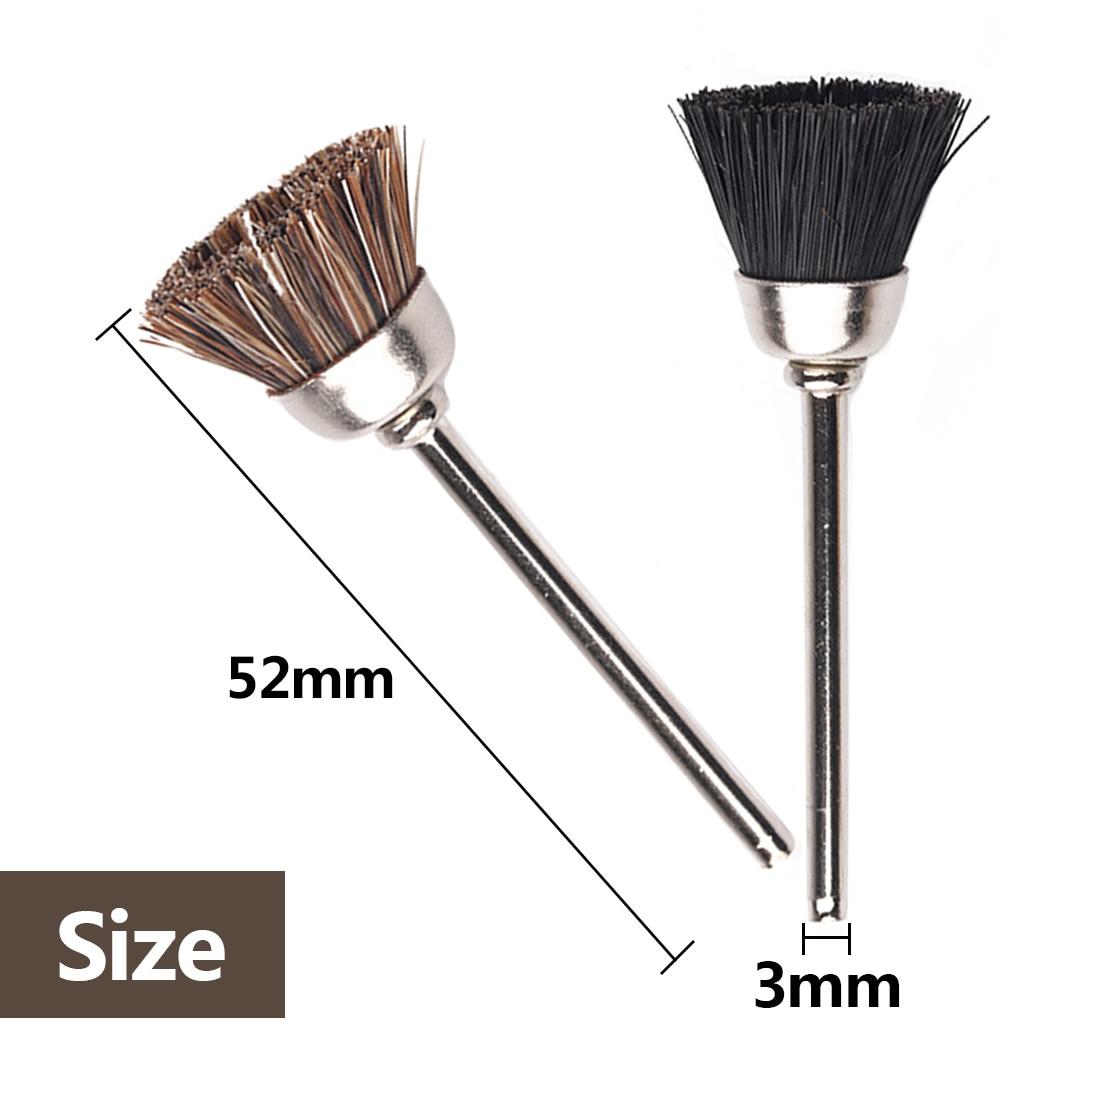 Metal Buffing Polishing 5pc 3mm Diameter Dremel Accessories Soft Pig /Horse Hair Polishing Cup Brush Wheel For Drill Rotary Tool